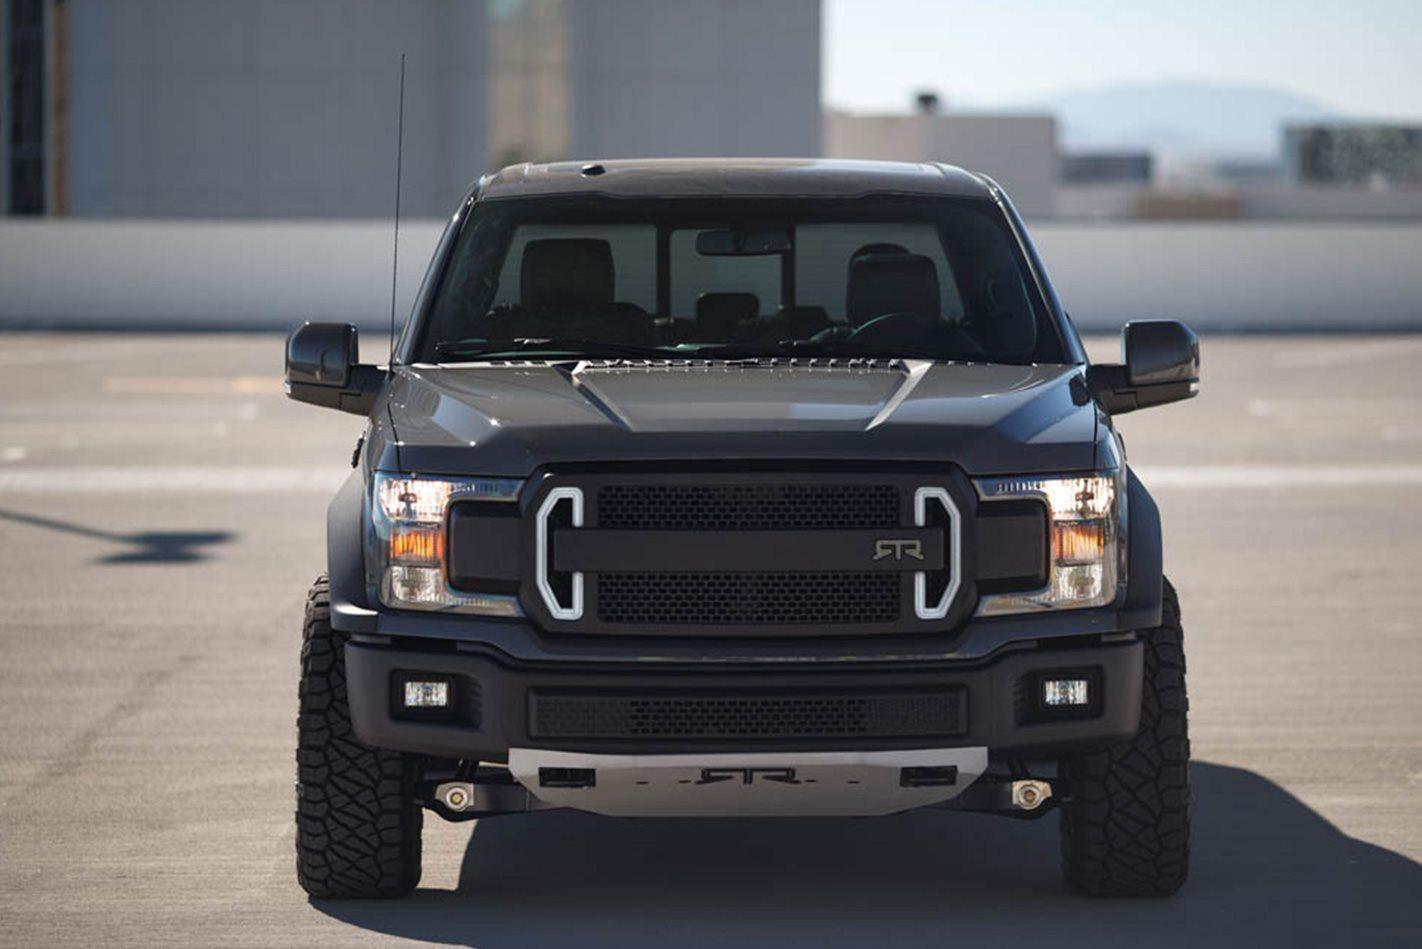 Ford-F-150-RTR-bashplate.jpg